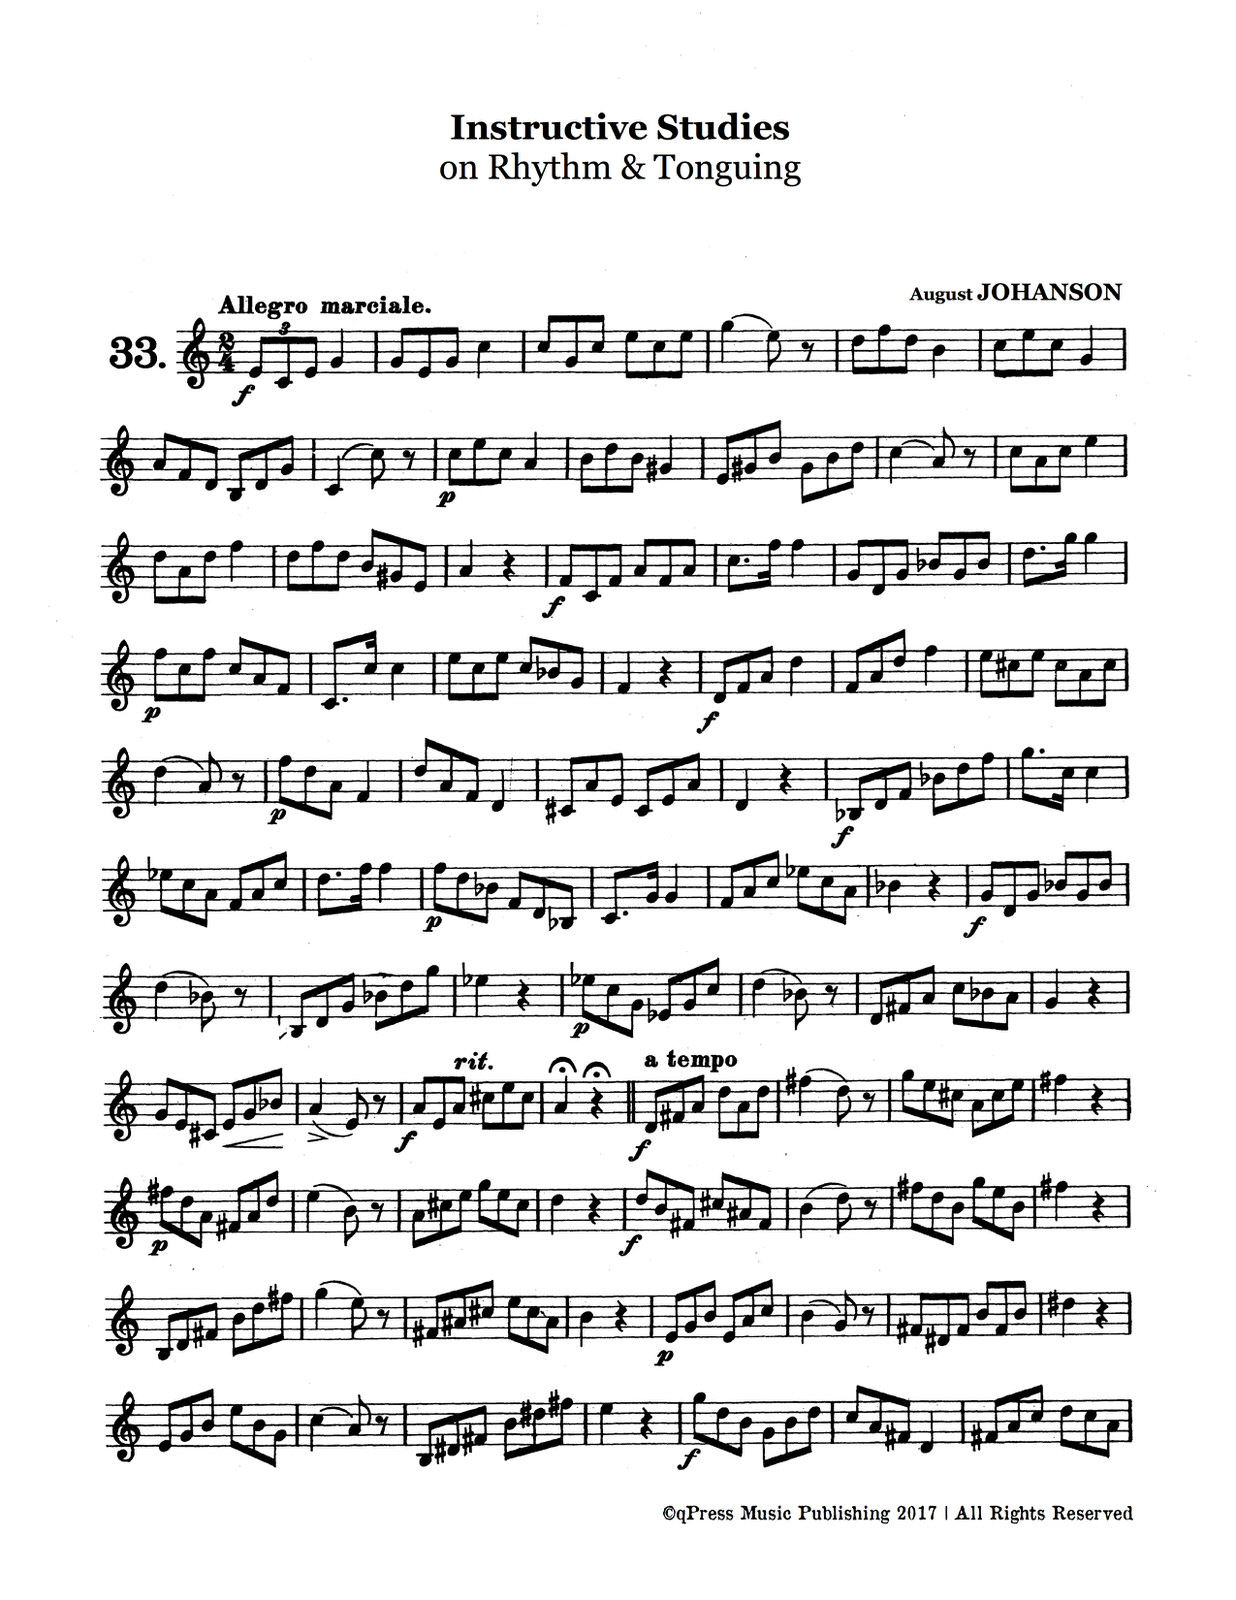 Johanson, Instructive Studies on Rhythm and Tonguing-p03